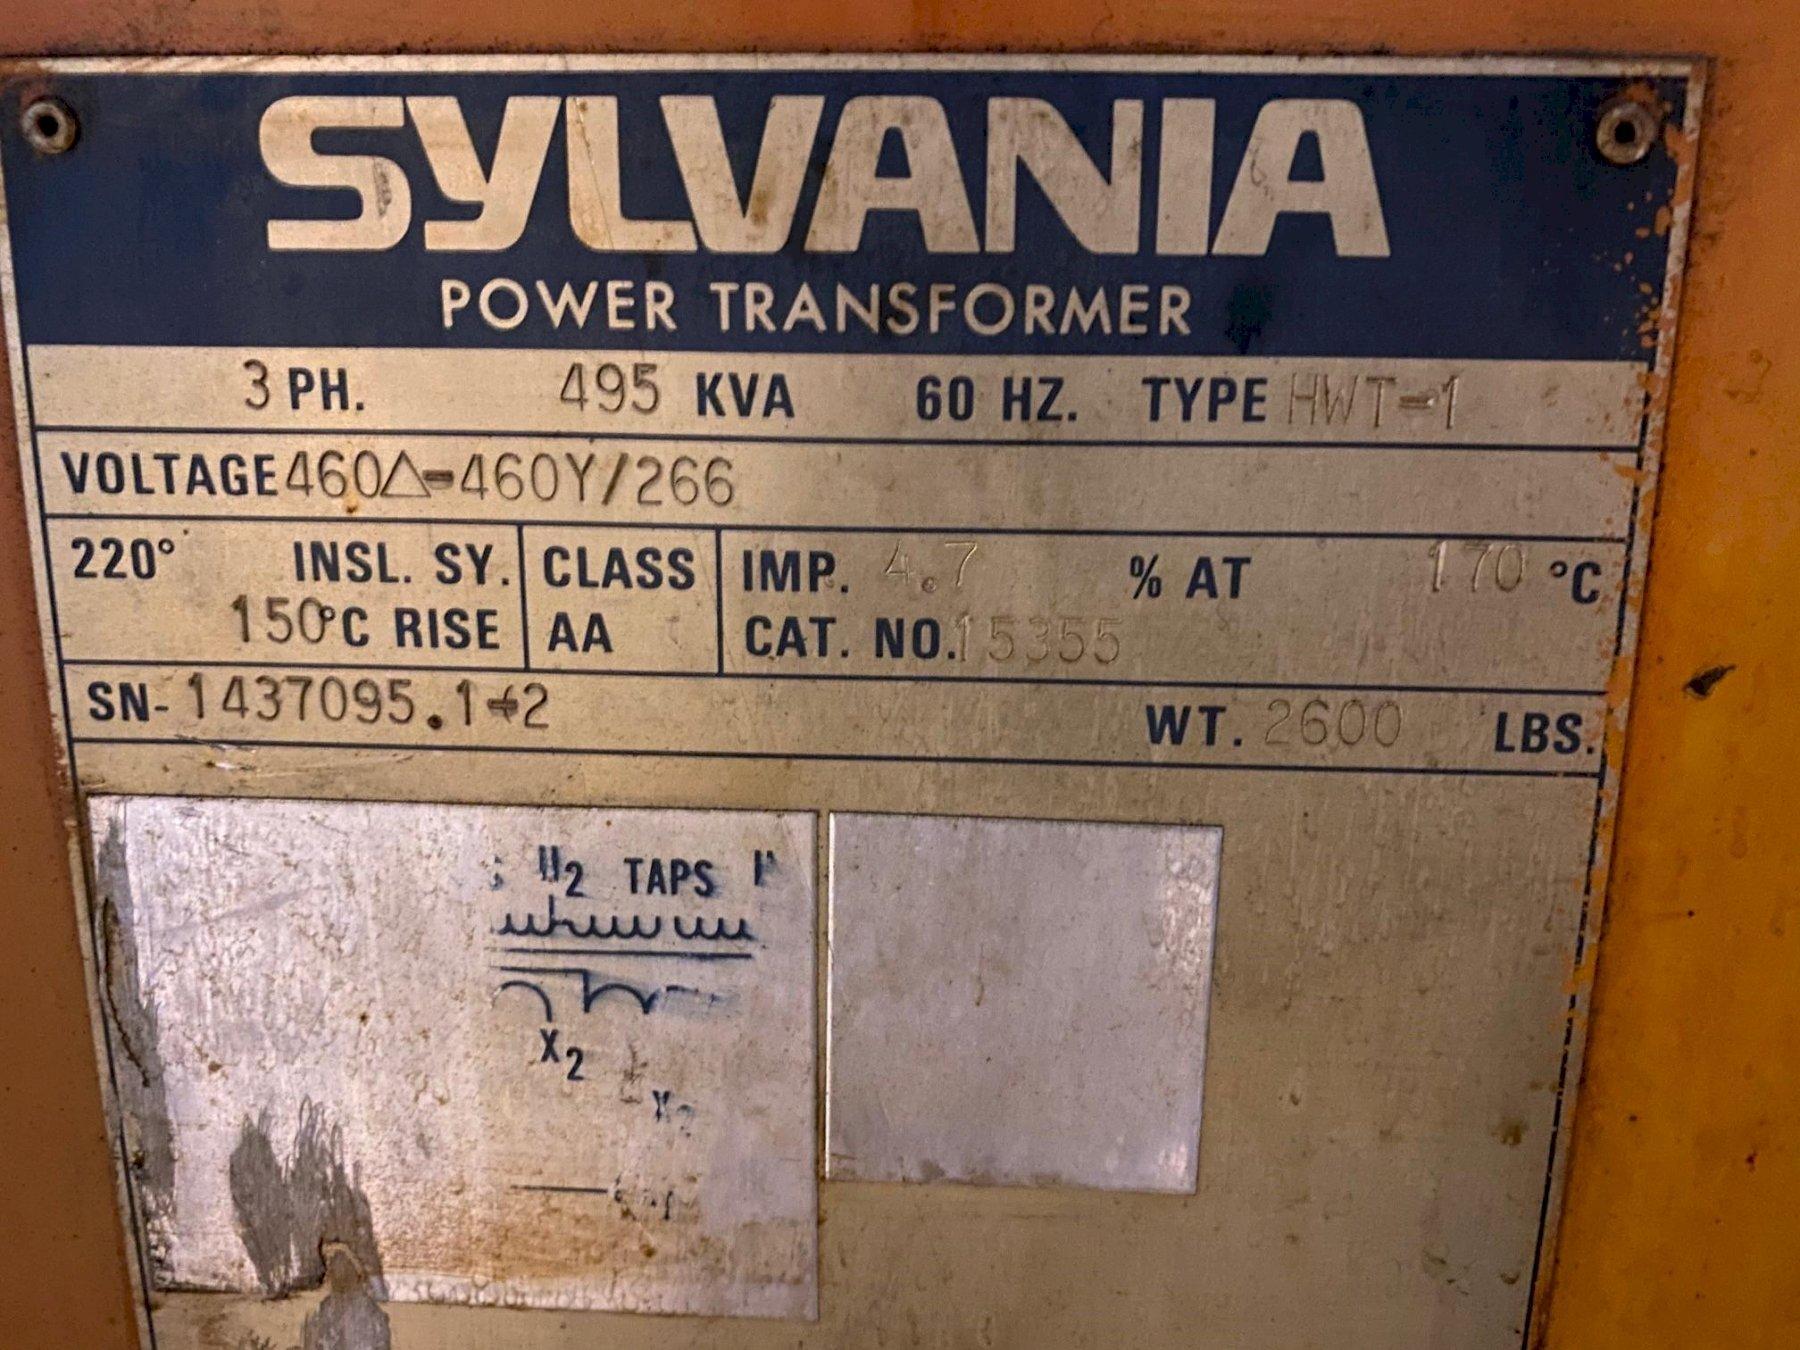 495 KVA SYLVANIA POWER TRANSFORMER. STOCK # 1059320